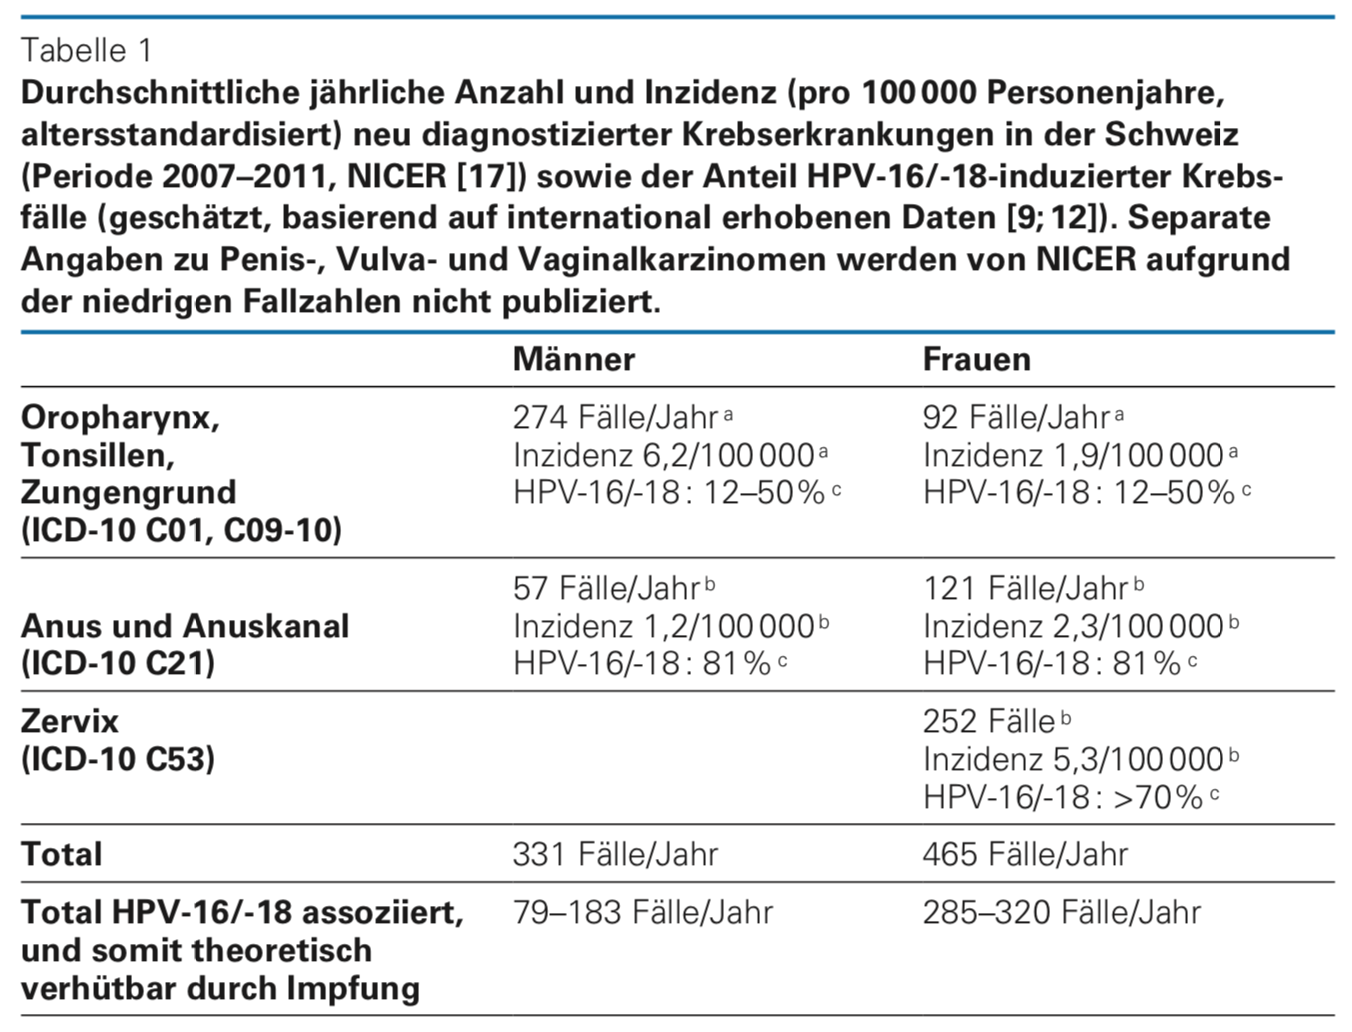 hpv viren impfung jungen nebenwirkungen